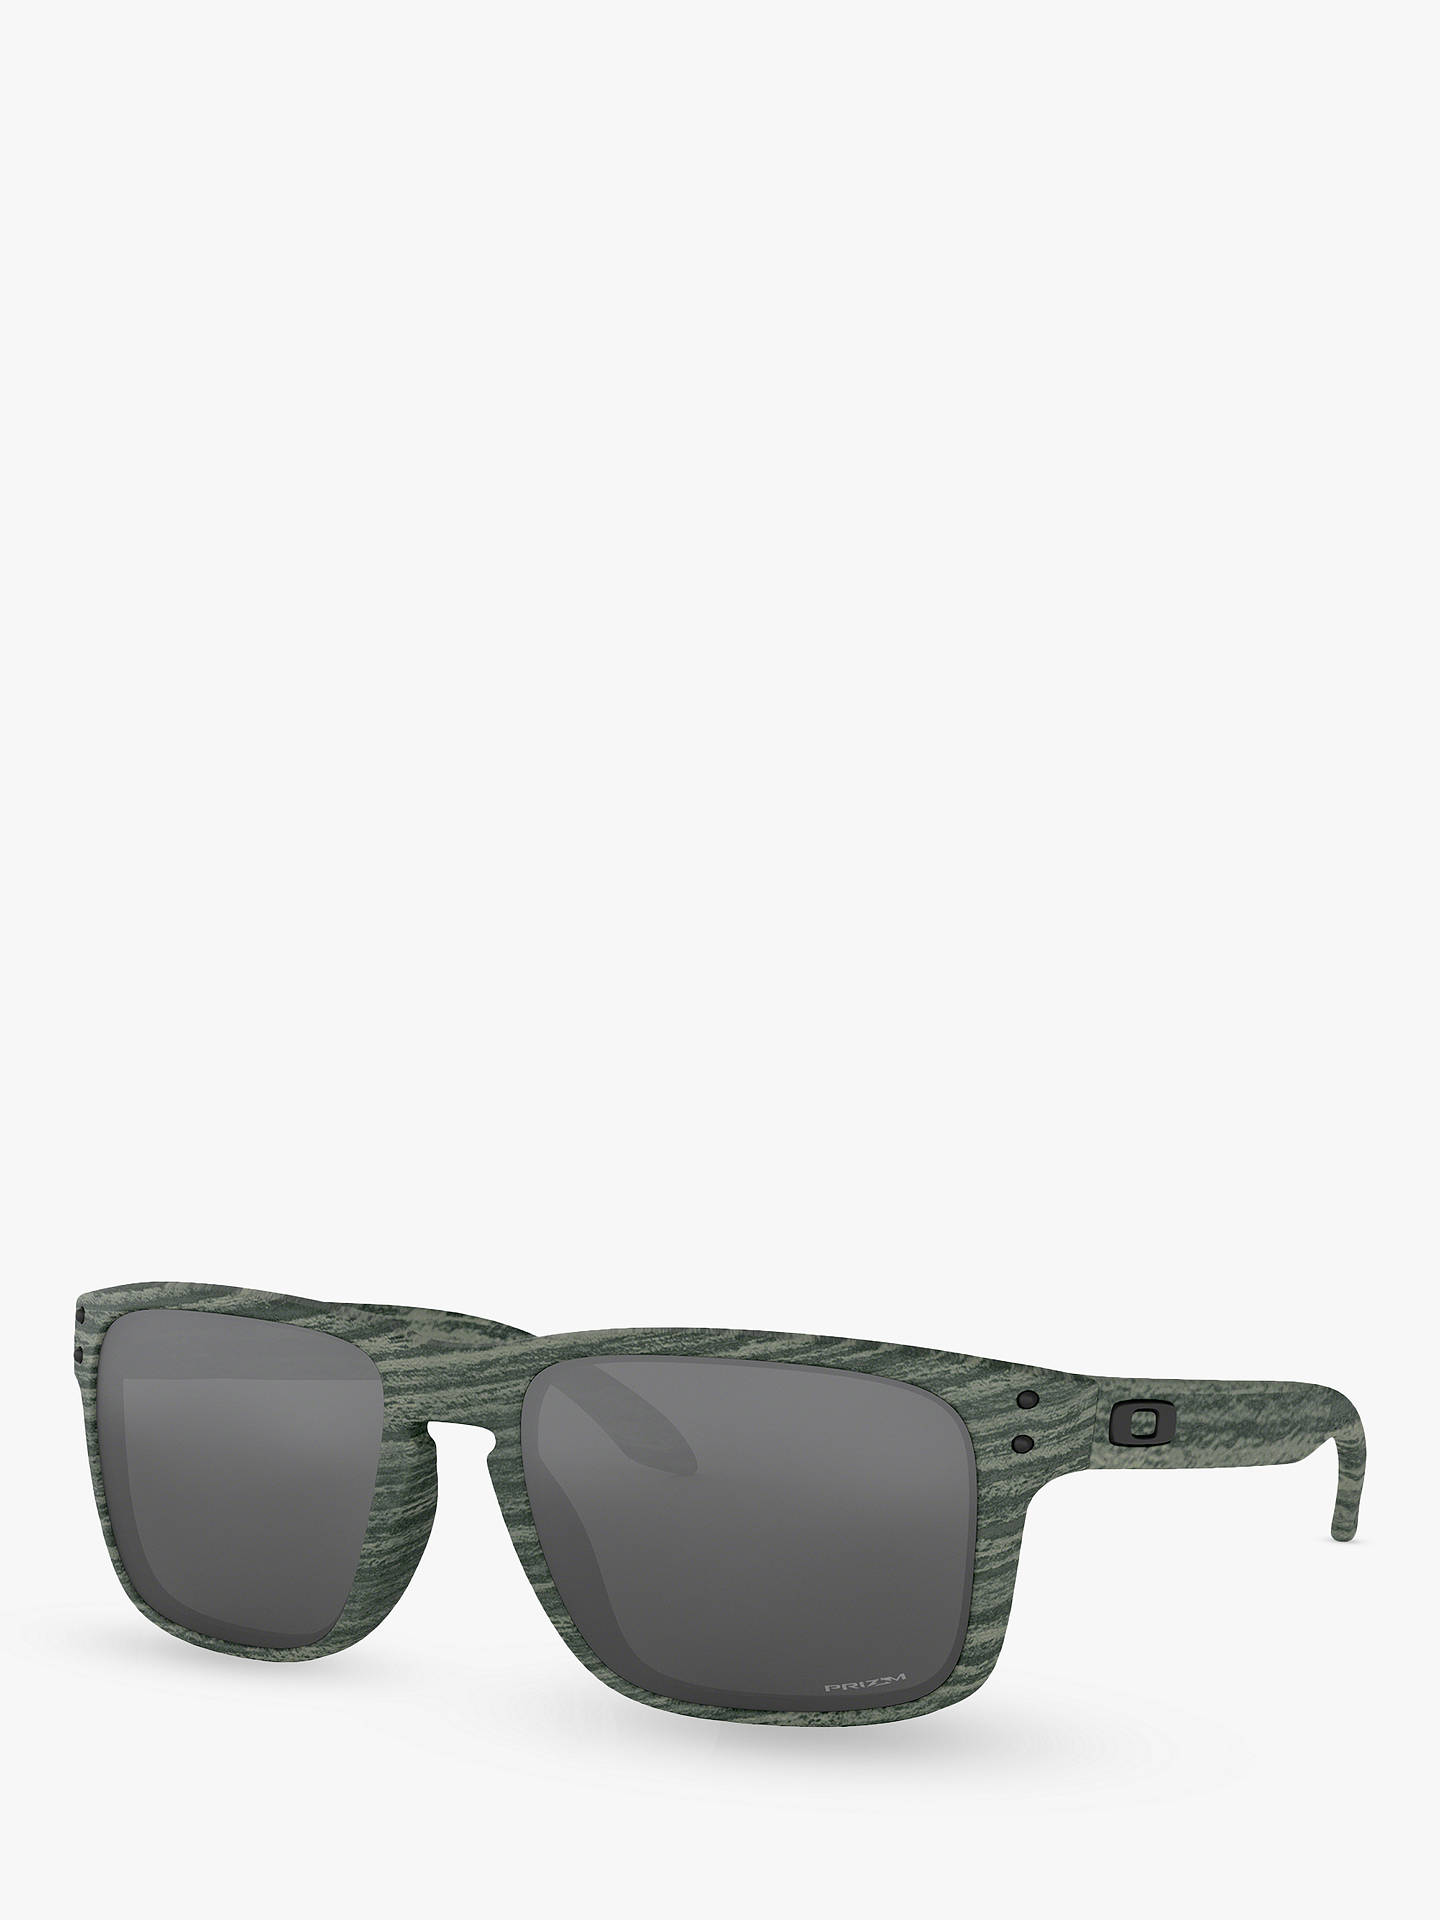 f65a9d6dd Buy Oakley OO9102 Men's Holbrook Square Sunglasses, Multi/Mirror Black  Online at johnlewis.